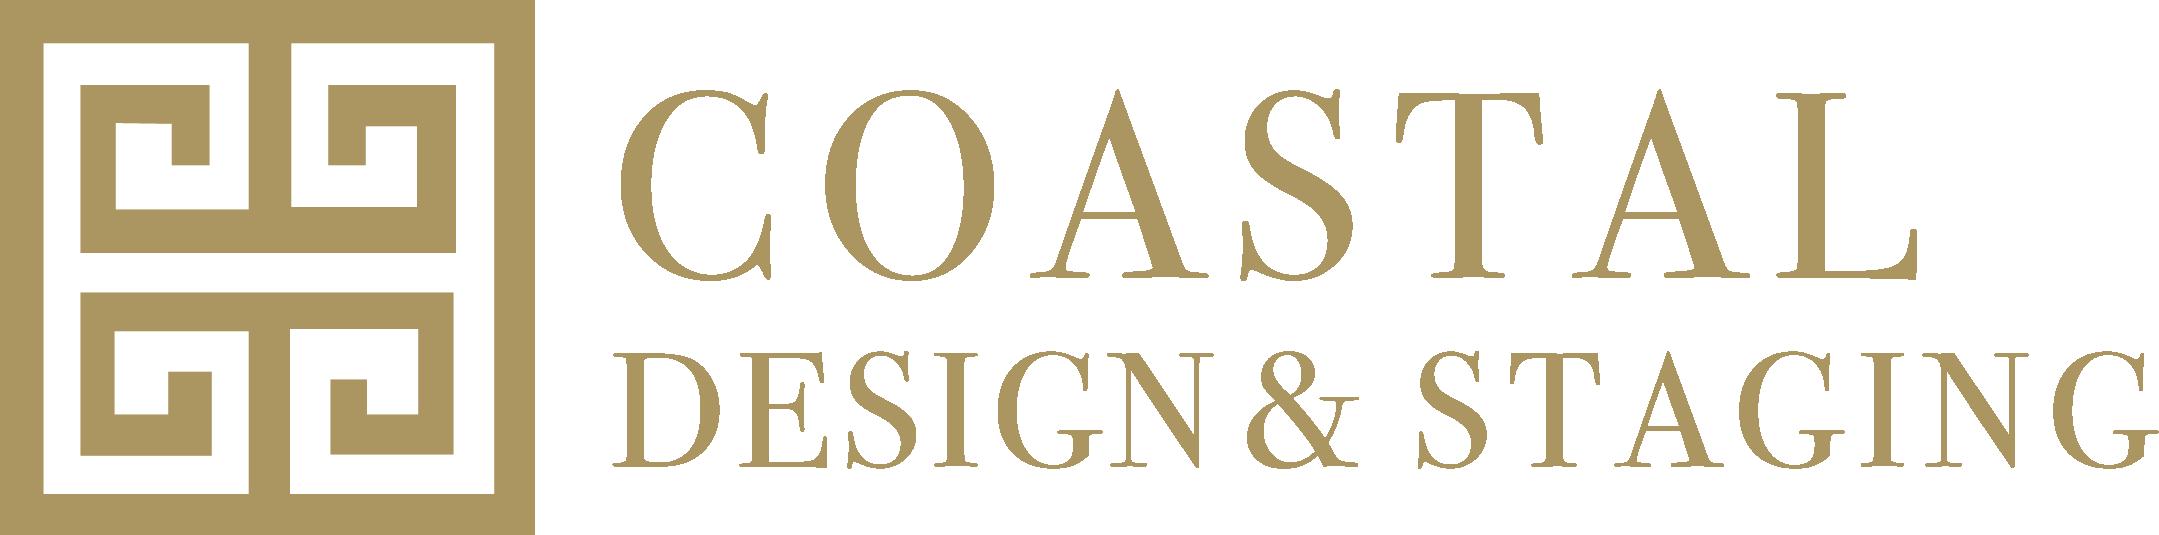 CostalDesign&StagingFinalLogo